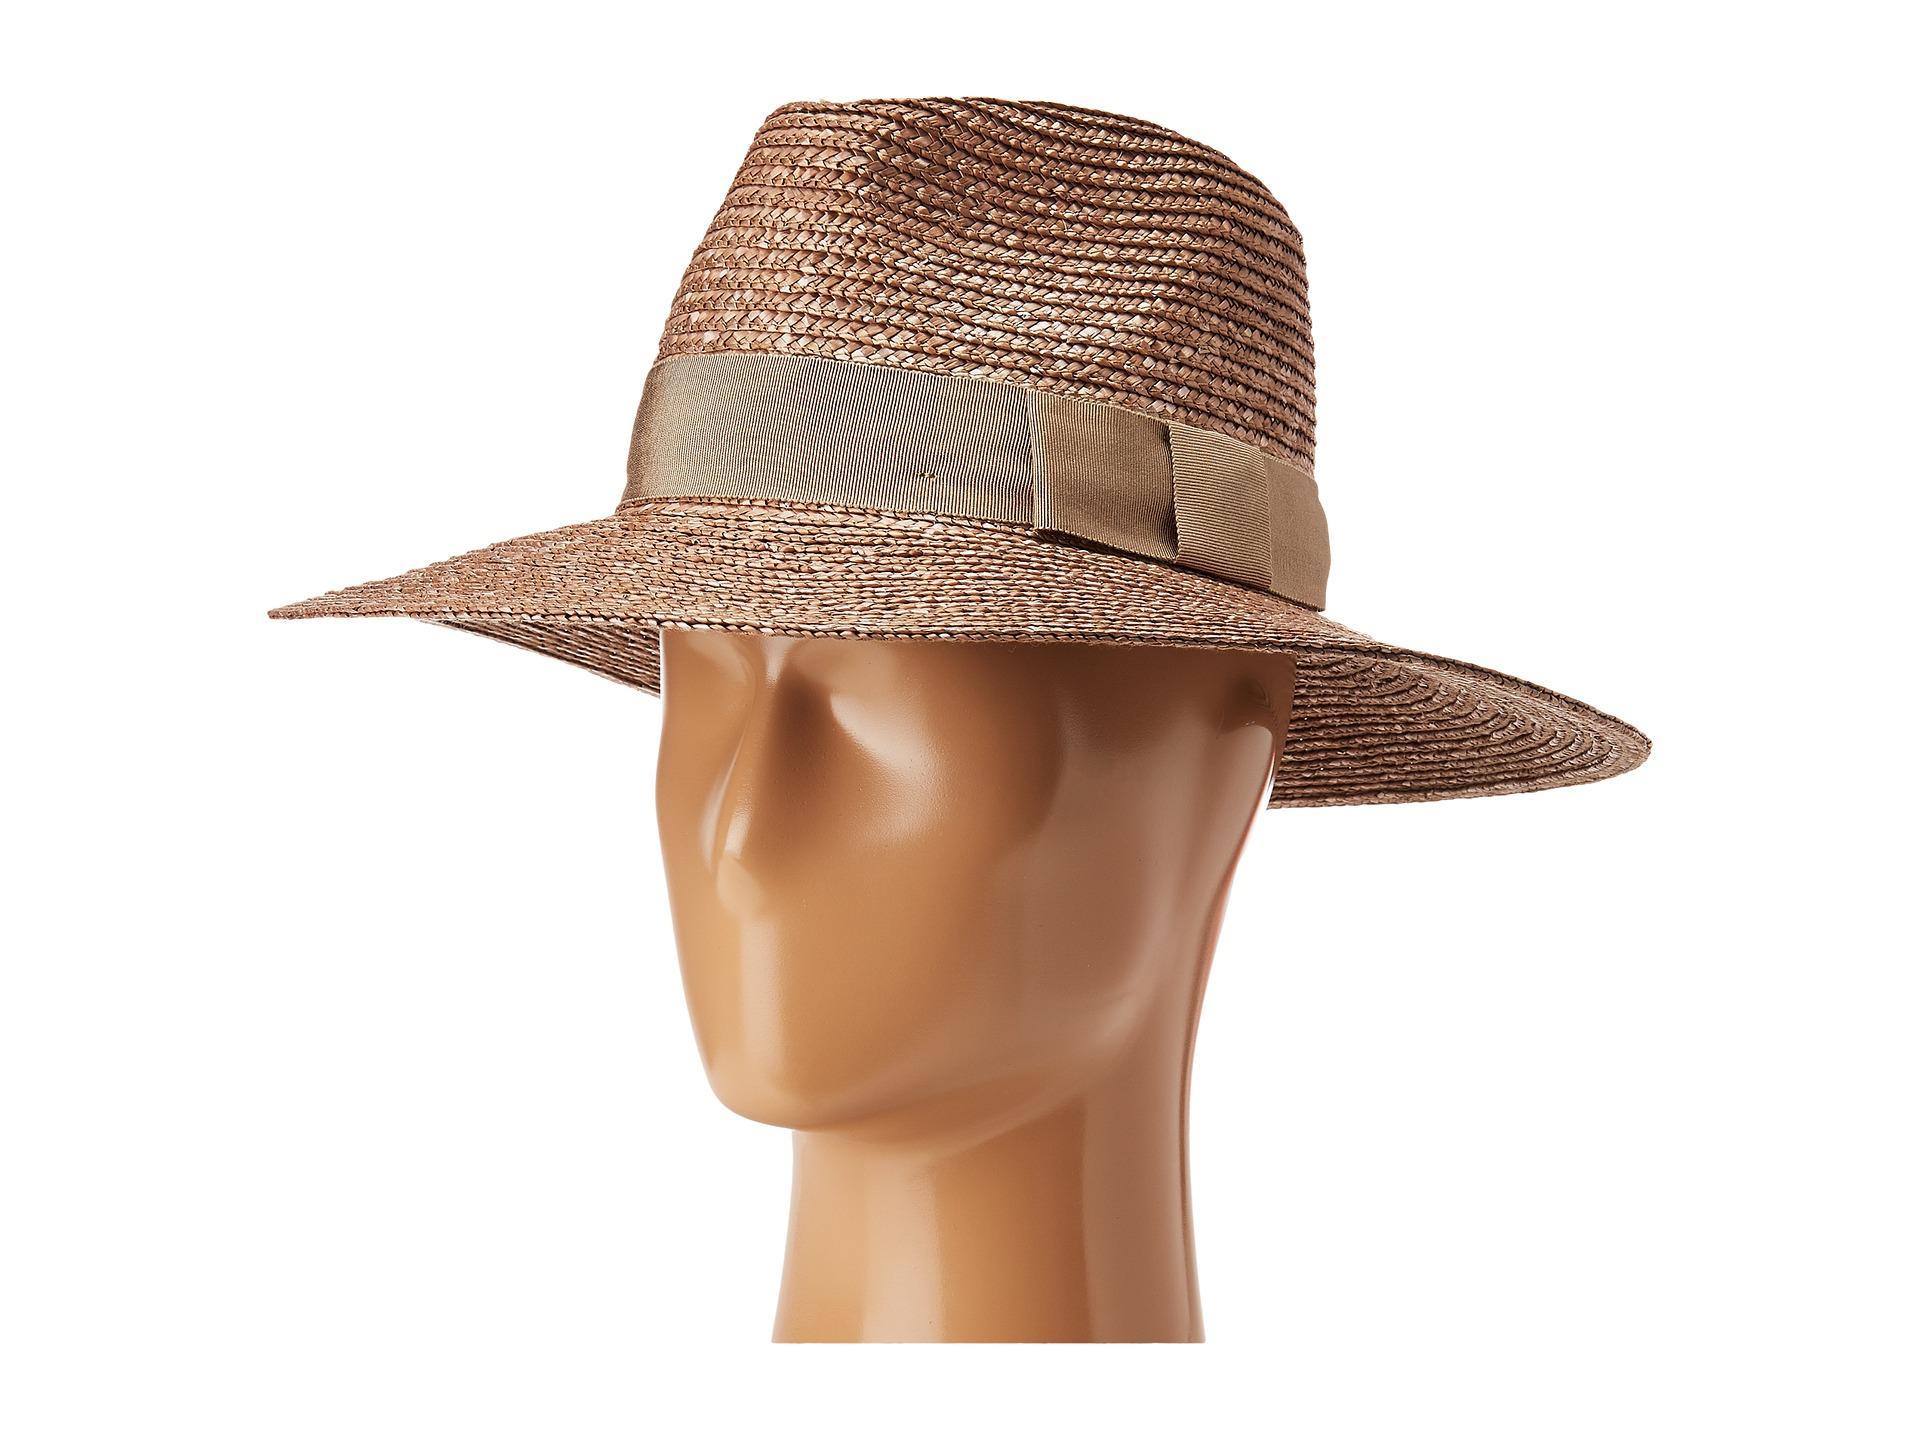 959fc3cdf61 Lyst - Brixton Joanna Hat in Brown